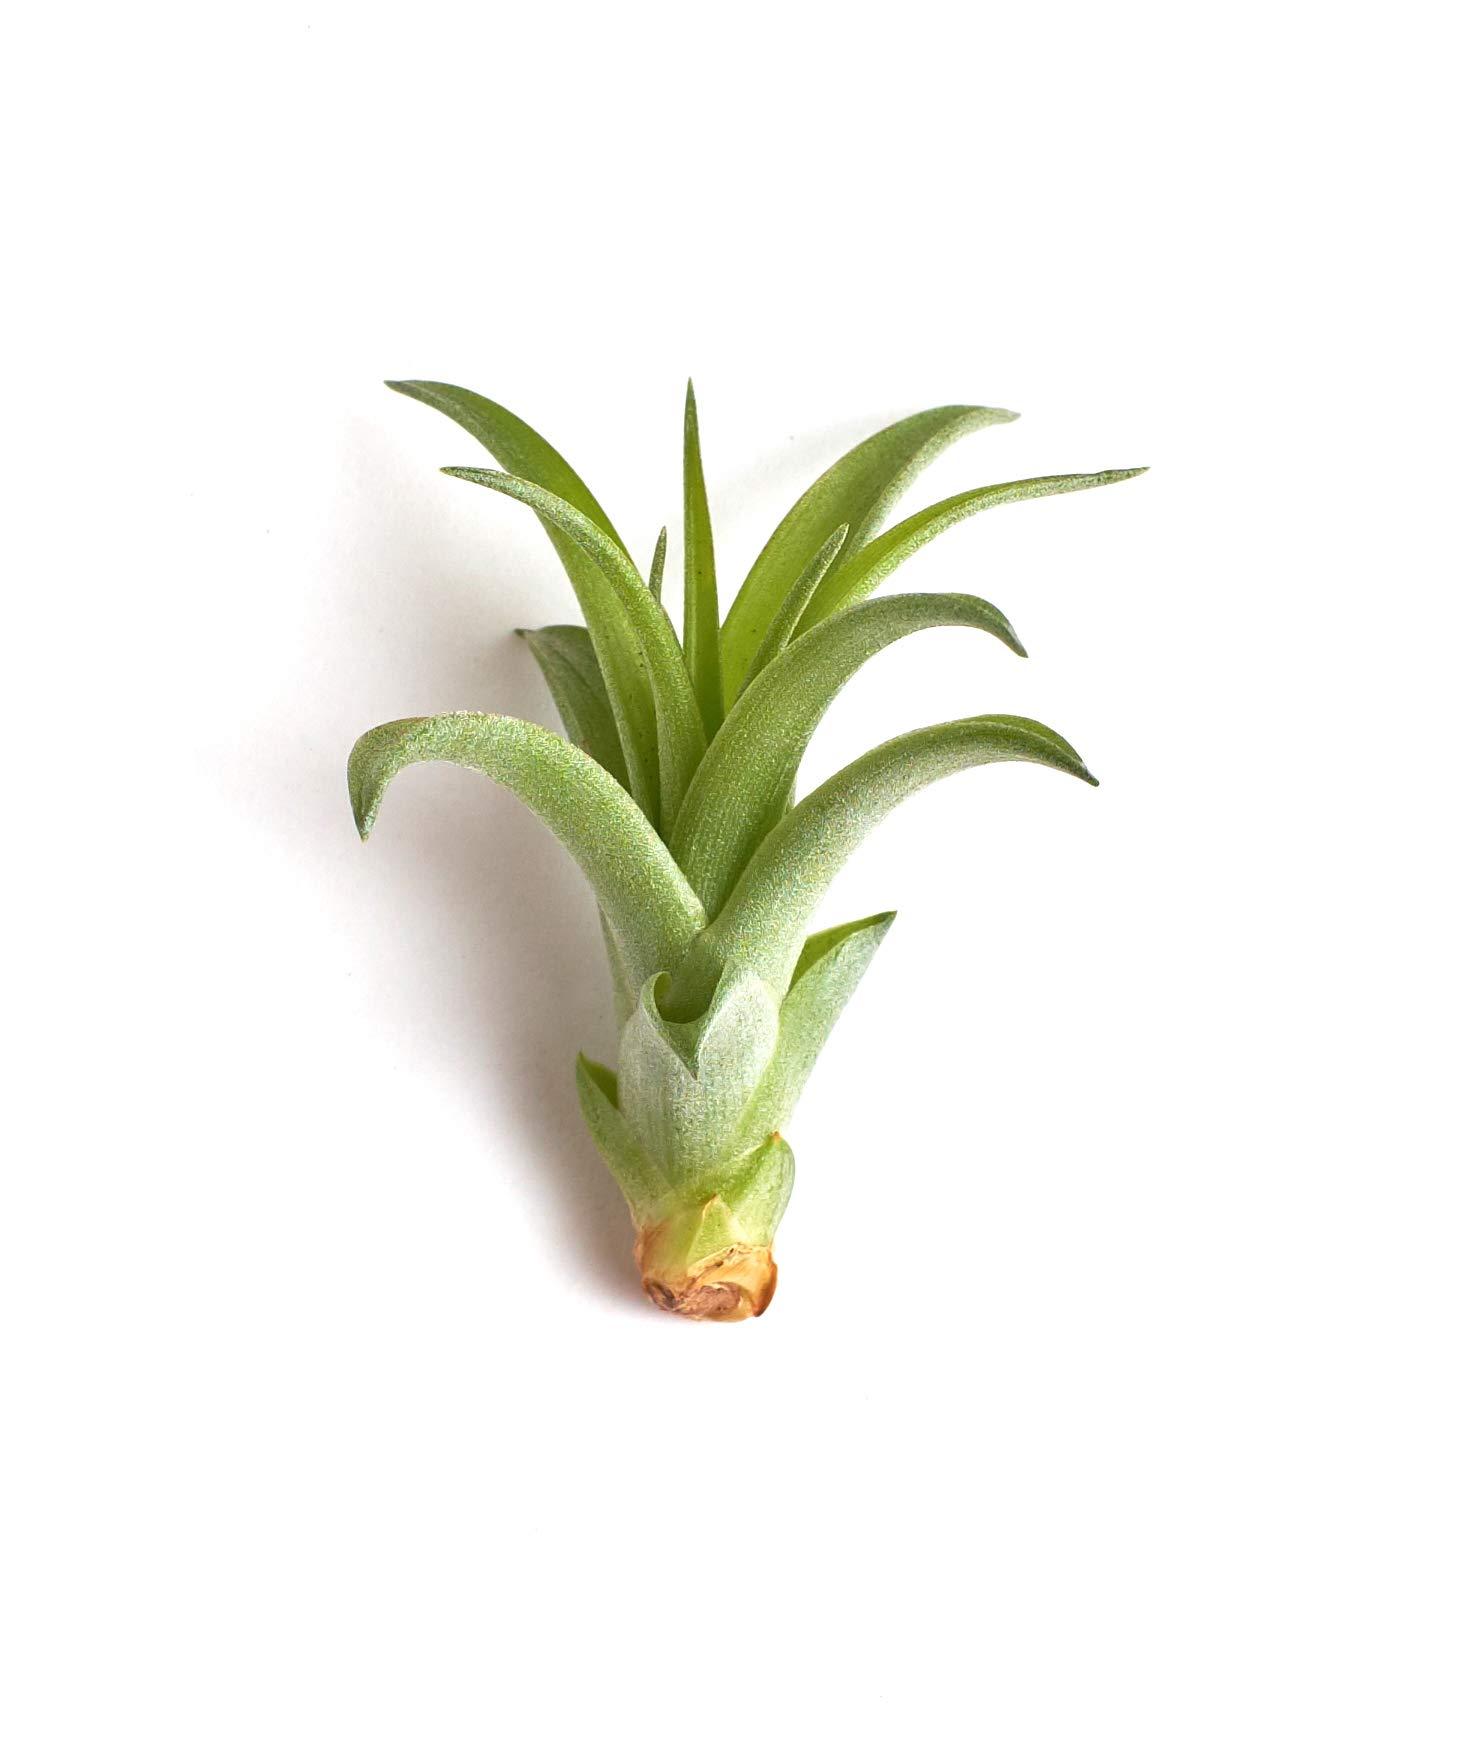 Shop Succulents Tillandsia Brachycaulos v. Multiflora Small Air Plant, Pack of 4